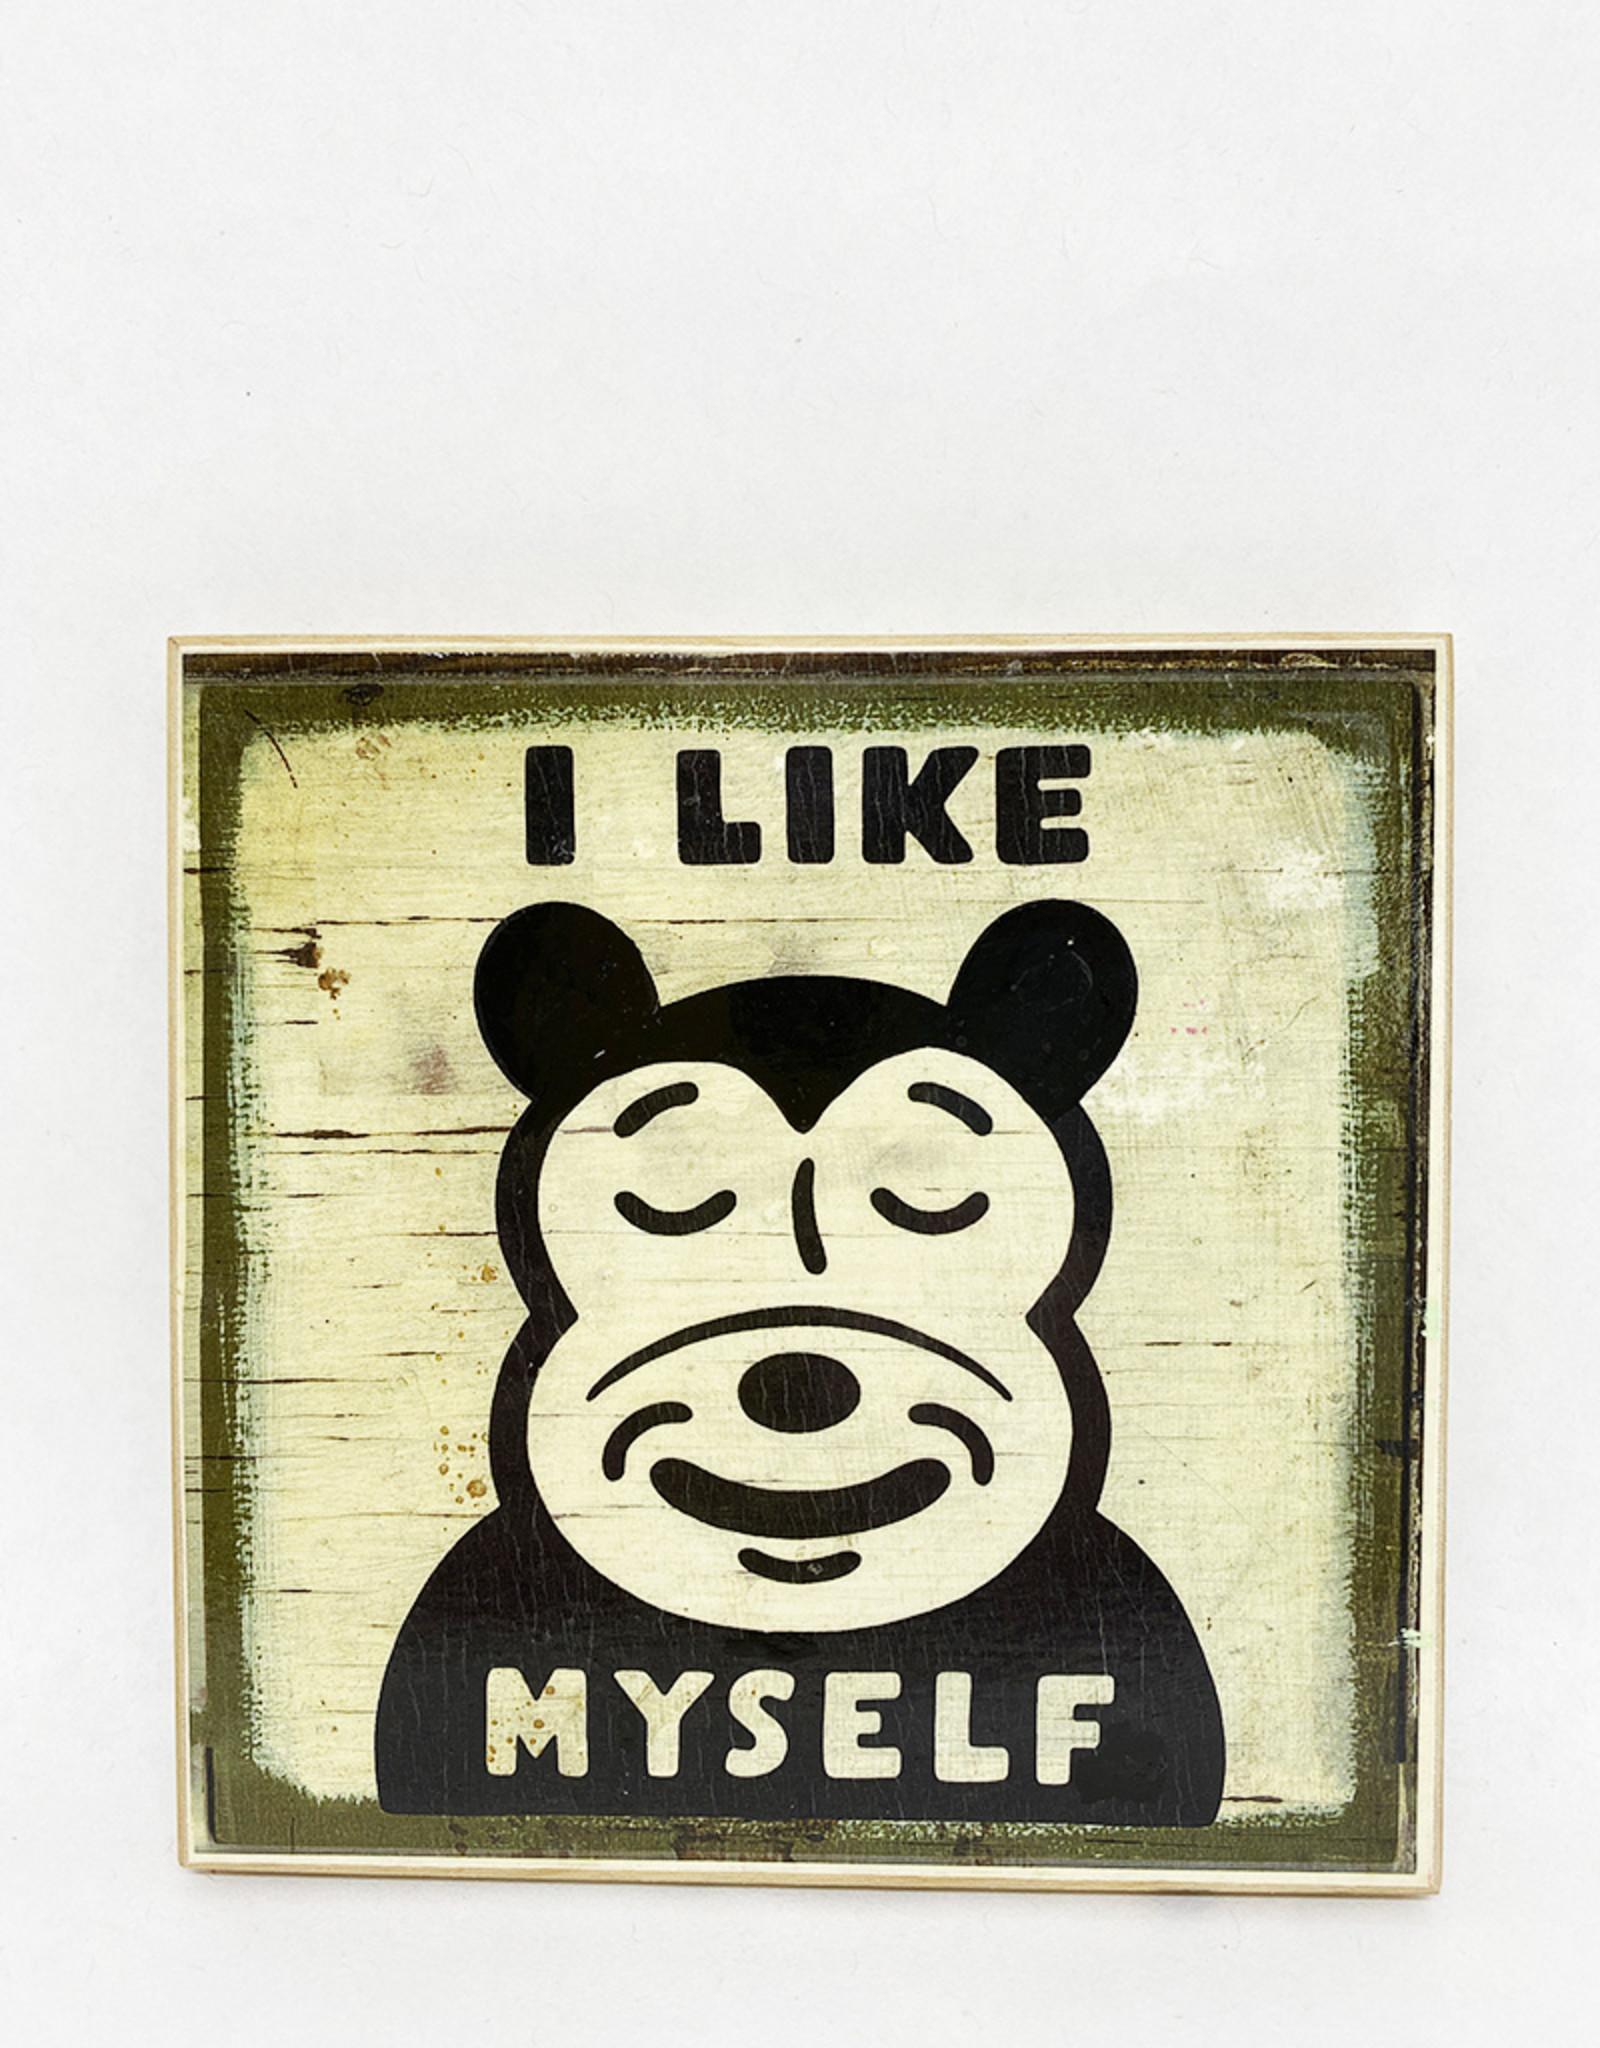 Dick Daniels I Like Myself Image Transfer on Wood Block